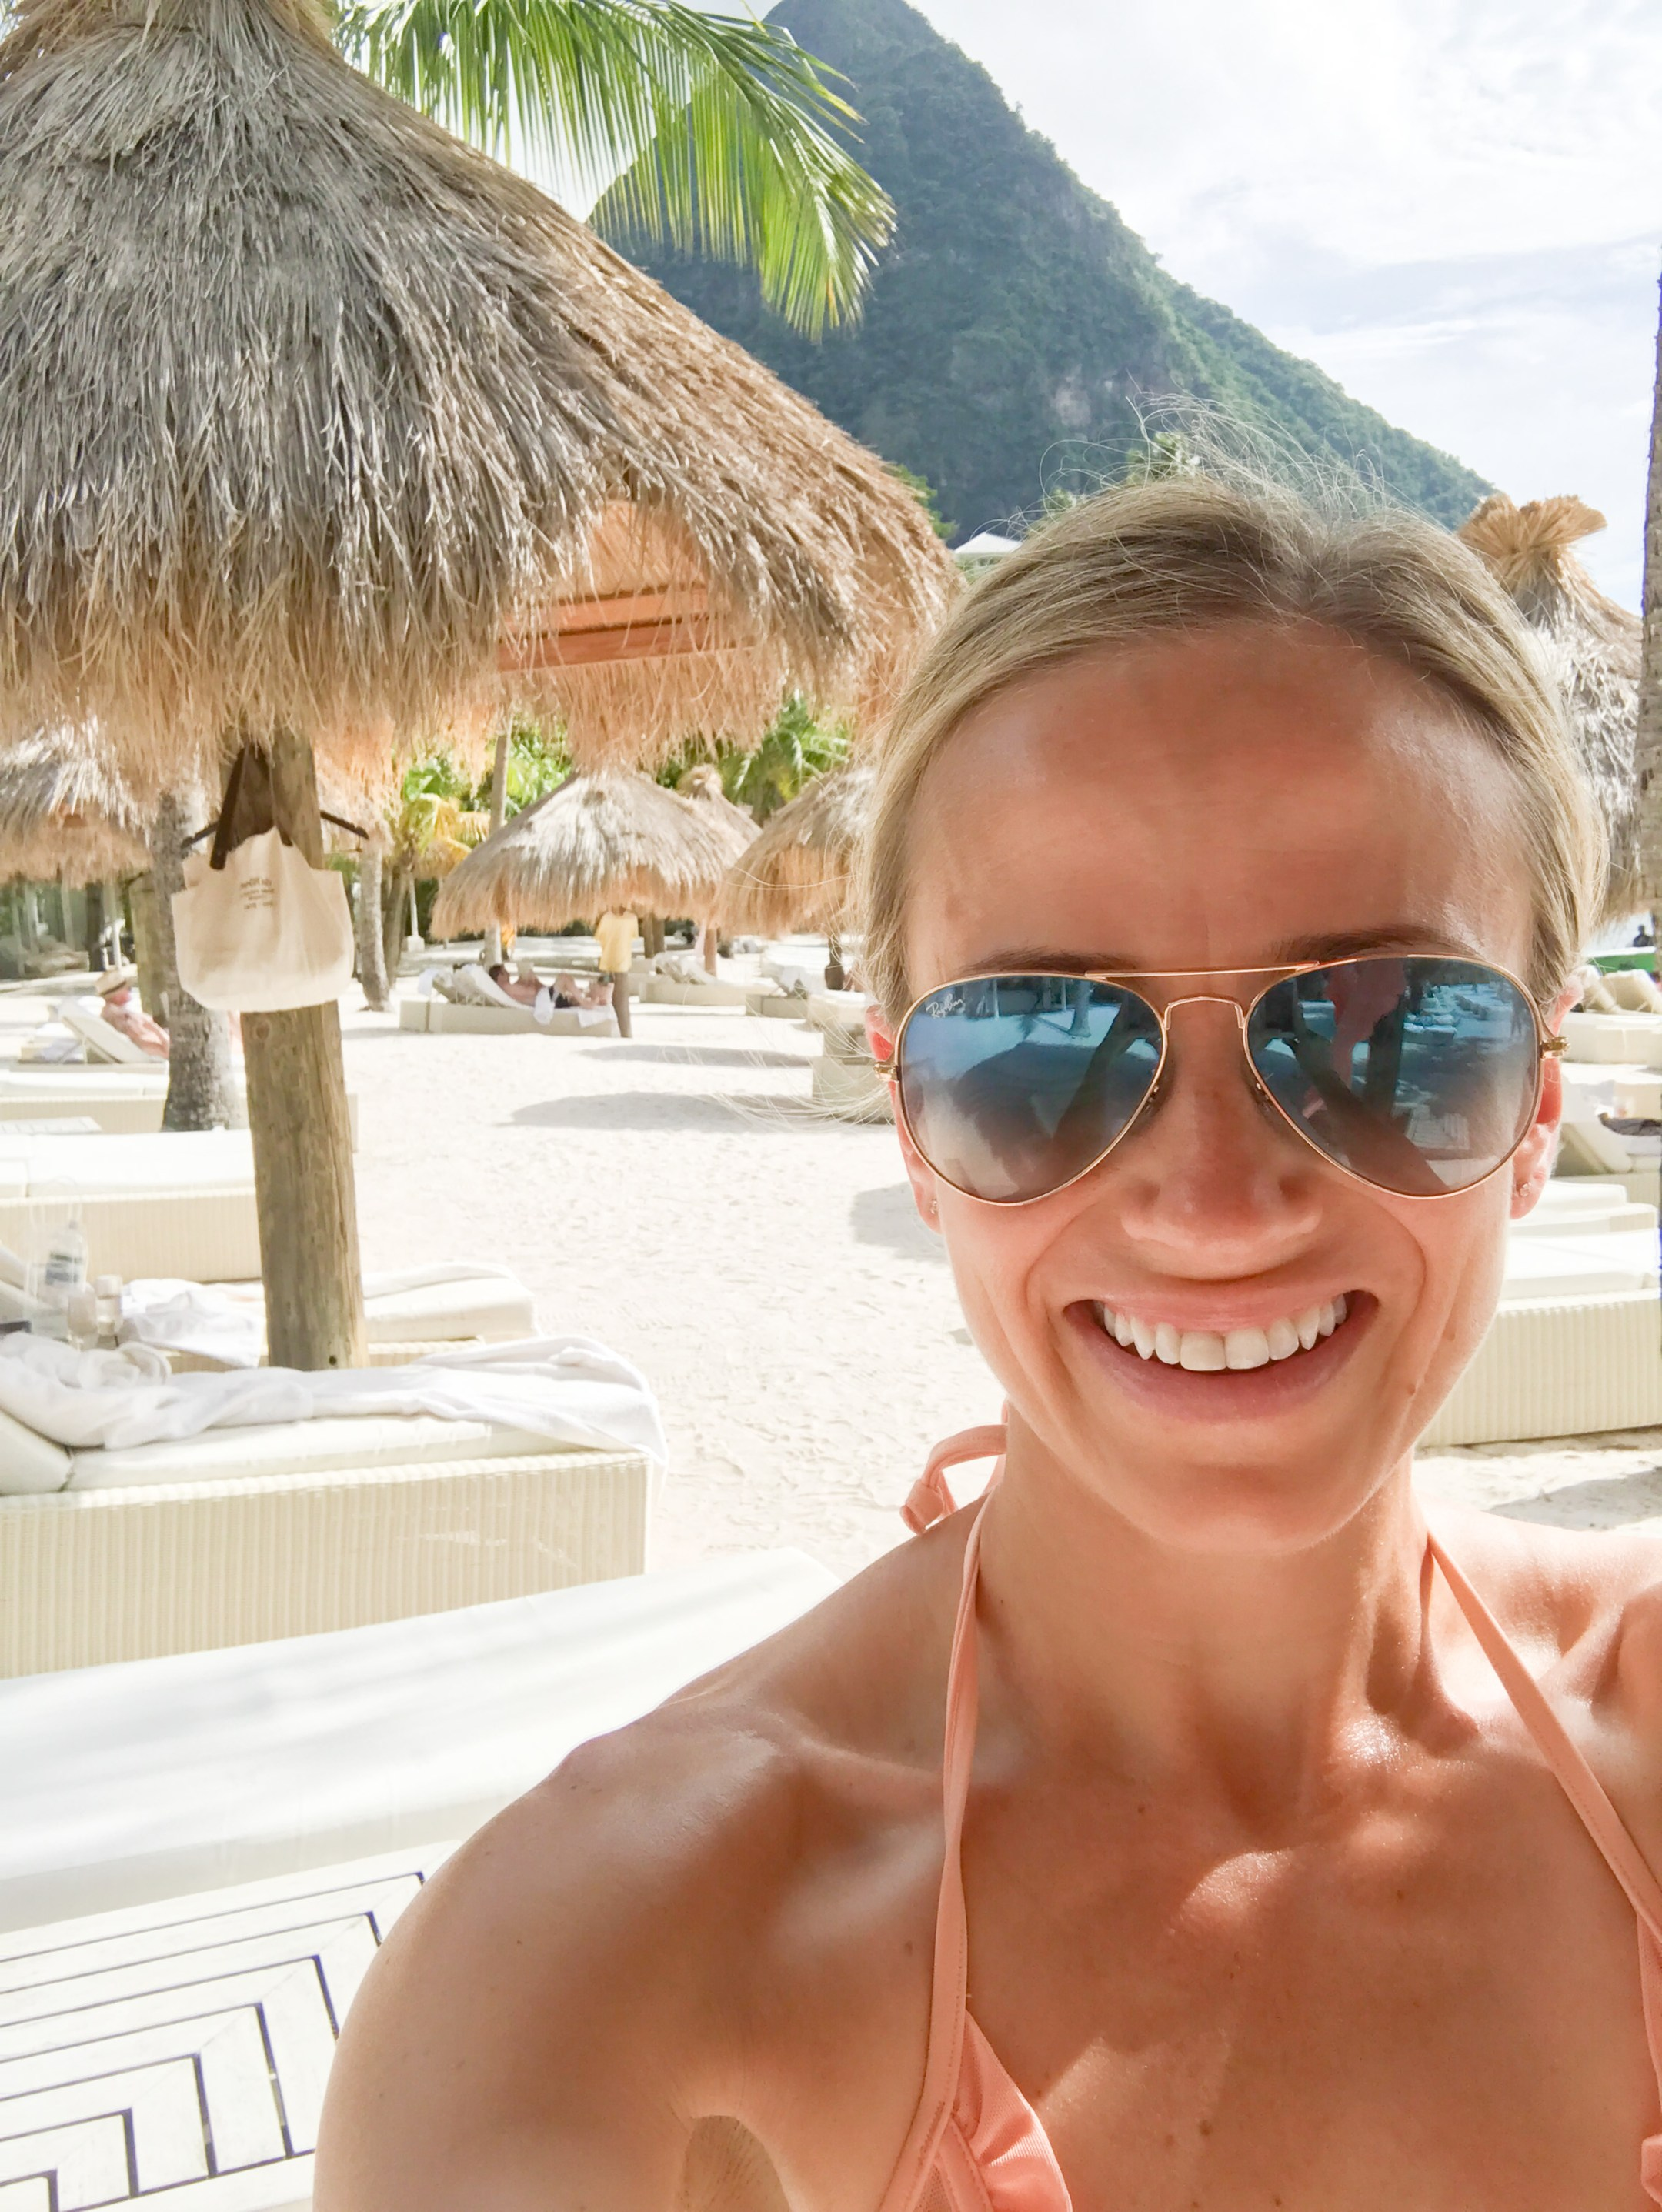 Honeymoon + Viceroy Sugar Beach St. Lucia Review (not ...